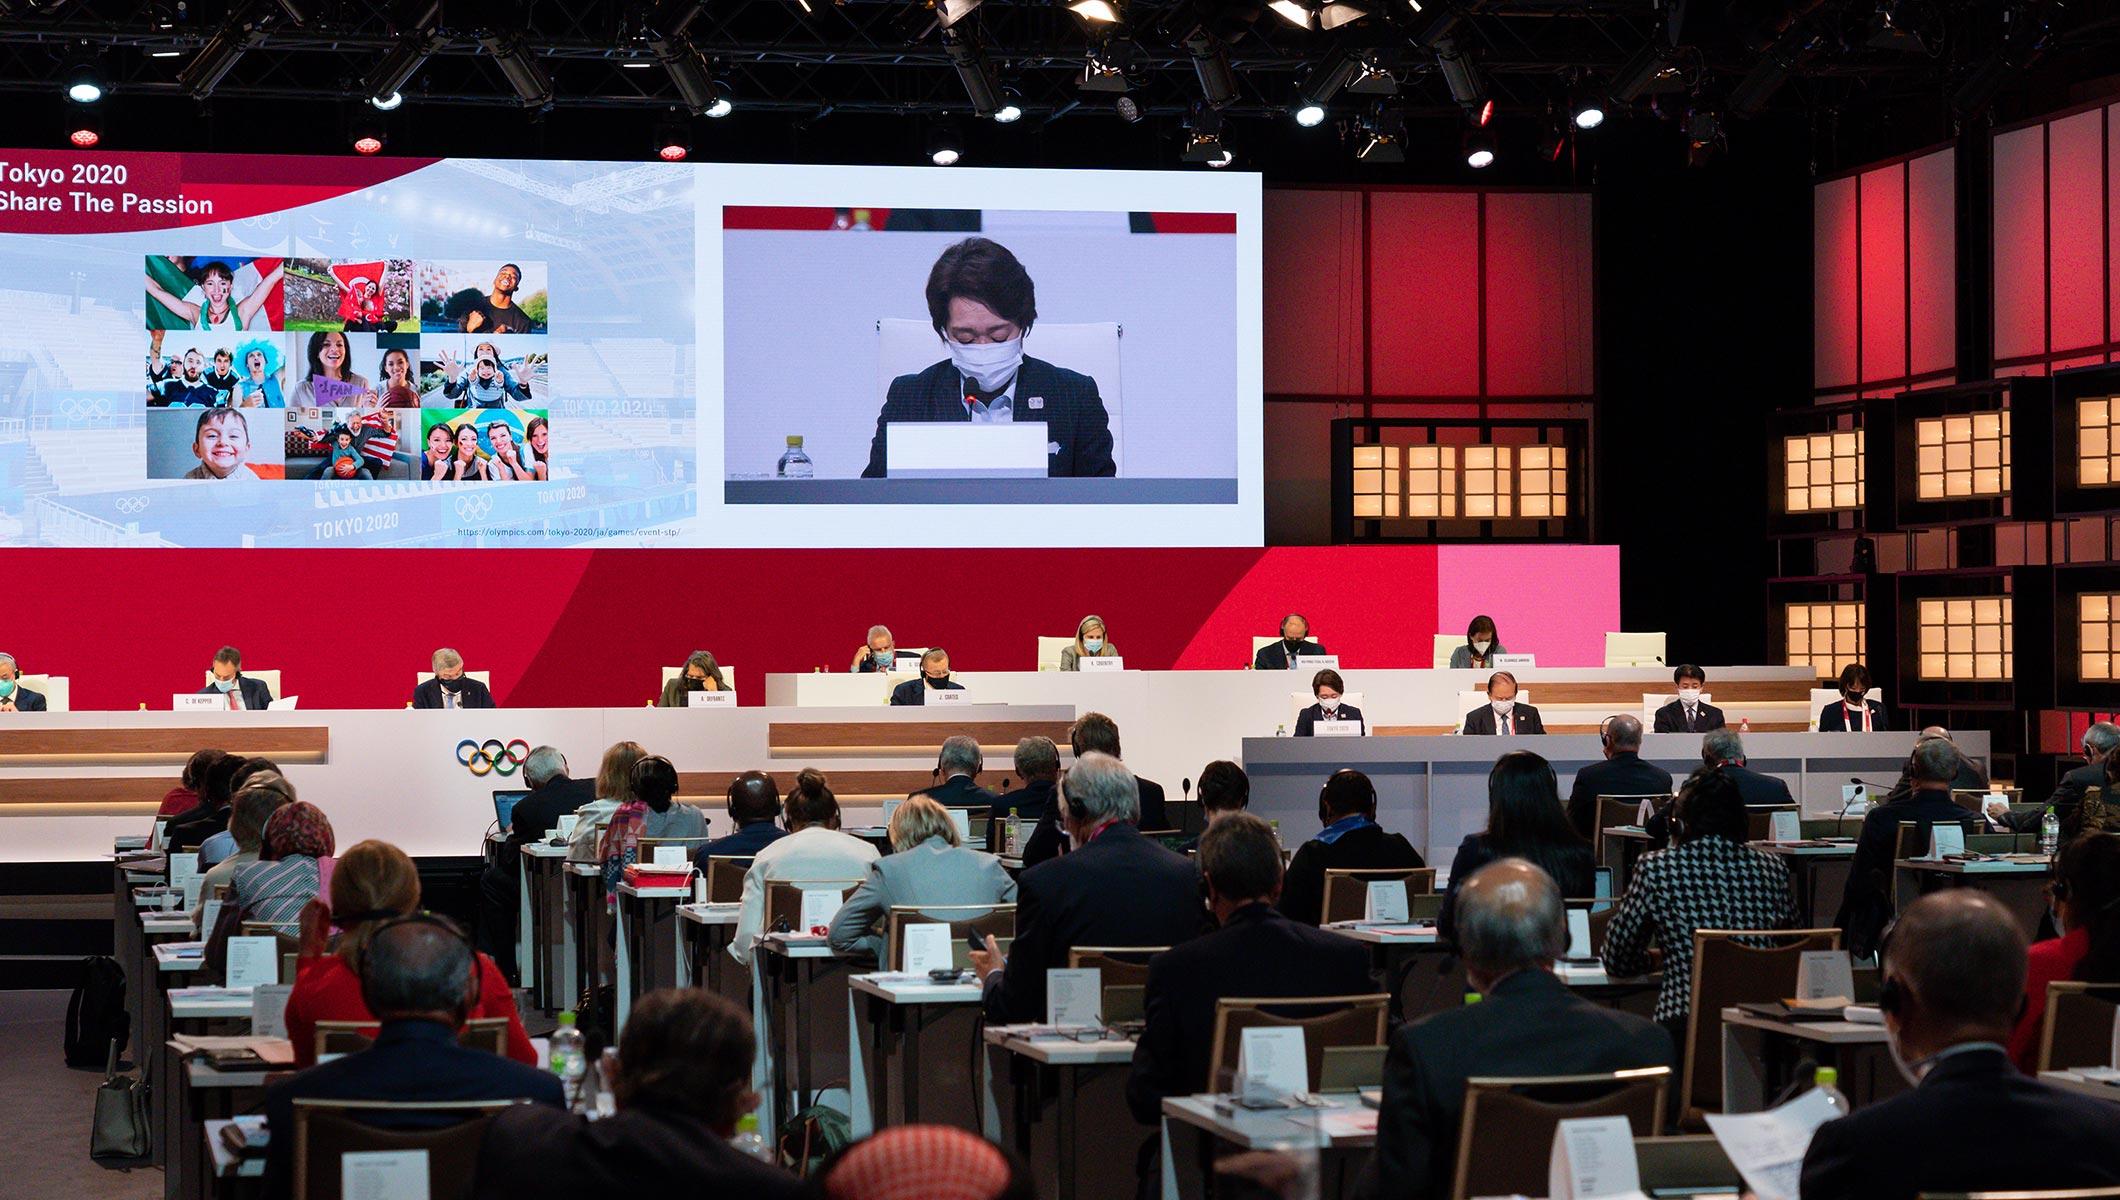 138th IOC Session at the Okura Hotel in Tokyo